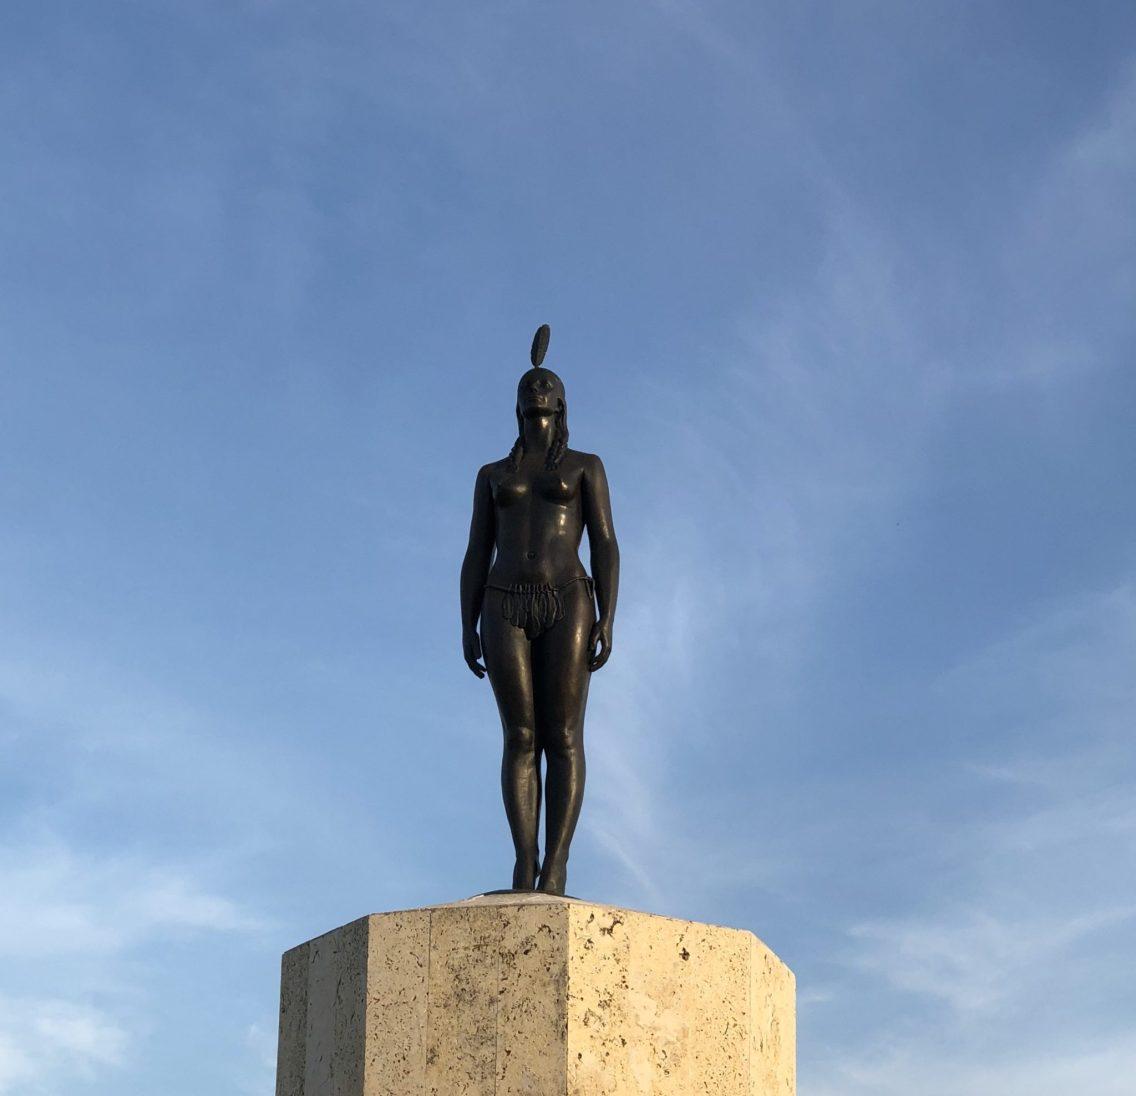 India Catalina statue, Cartagena, Colombia. Taken by Ervin Corzo